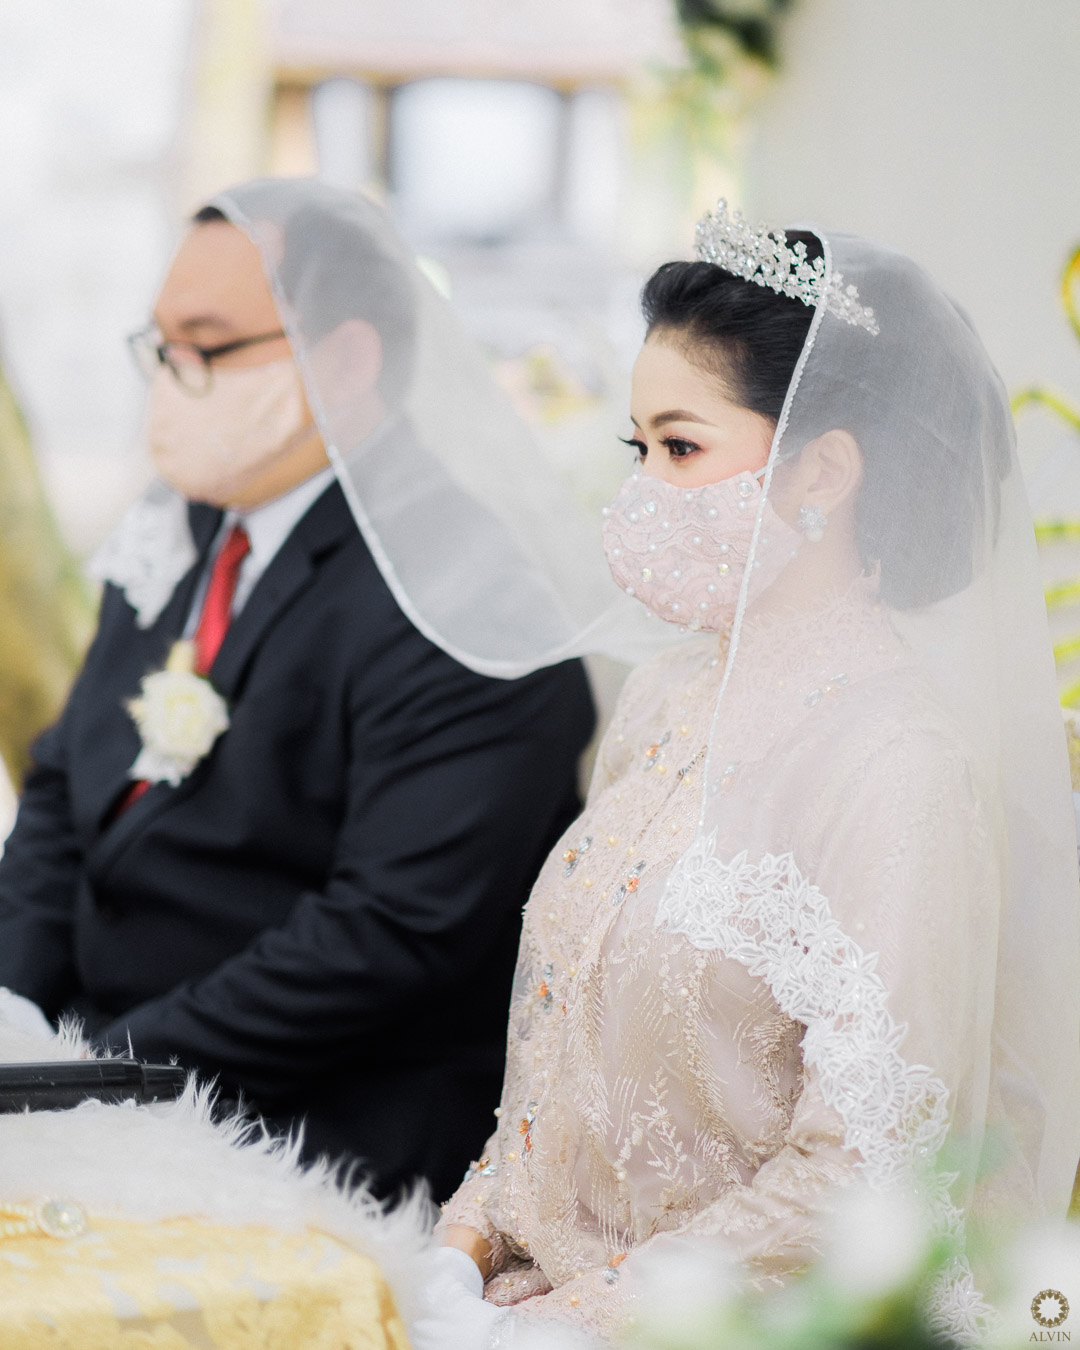 0 DSCF0262 : New Normal Wedding Ceremony